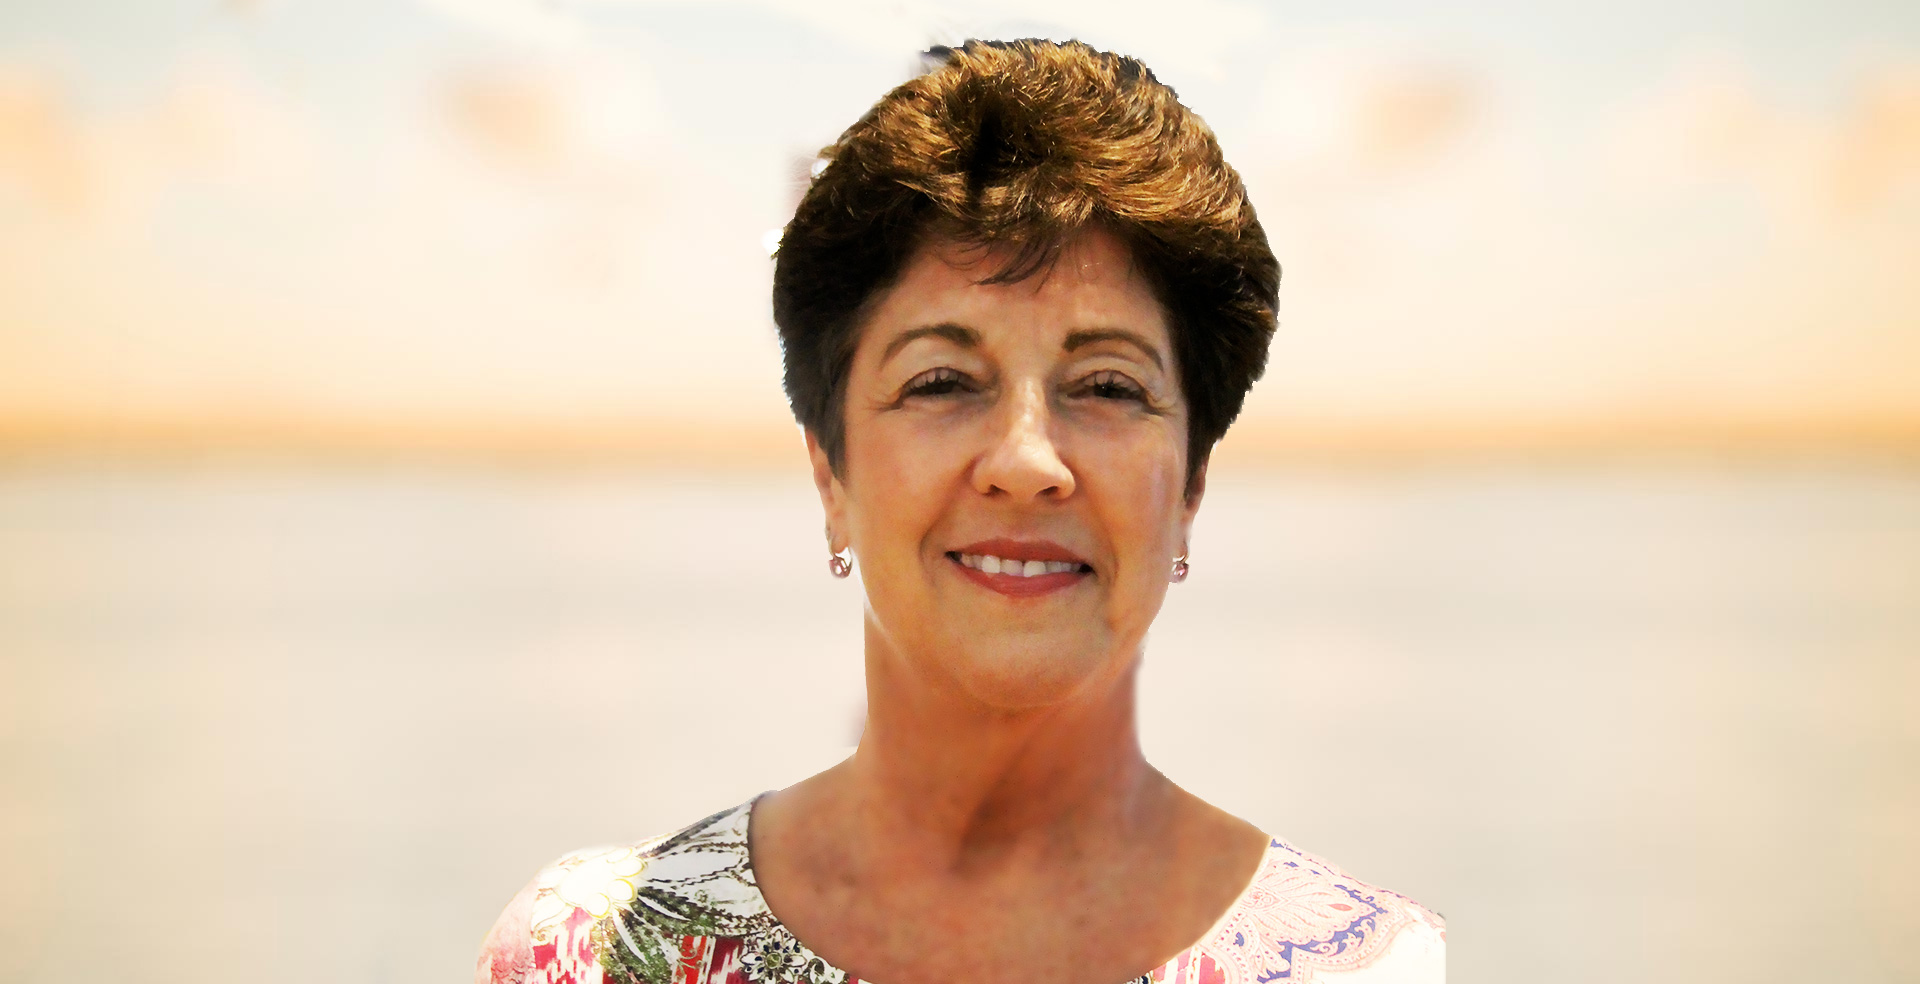 Linda Hammontree